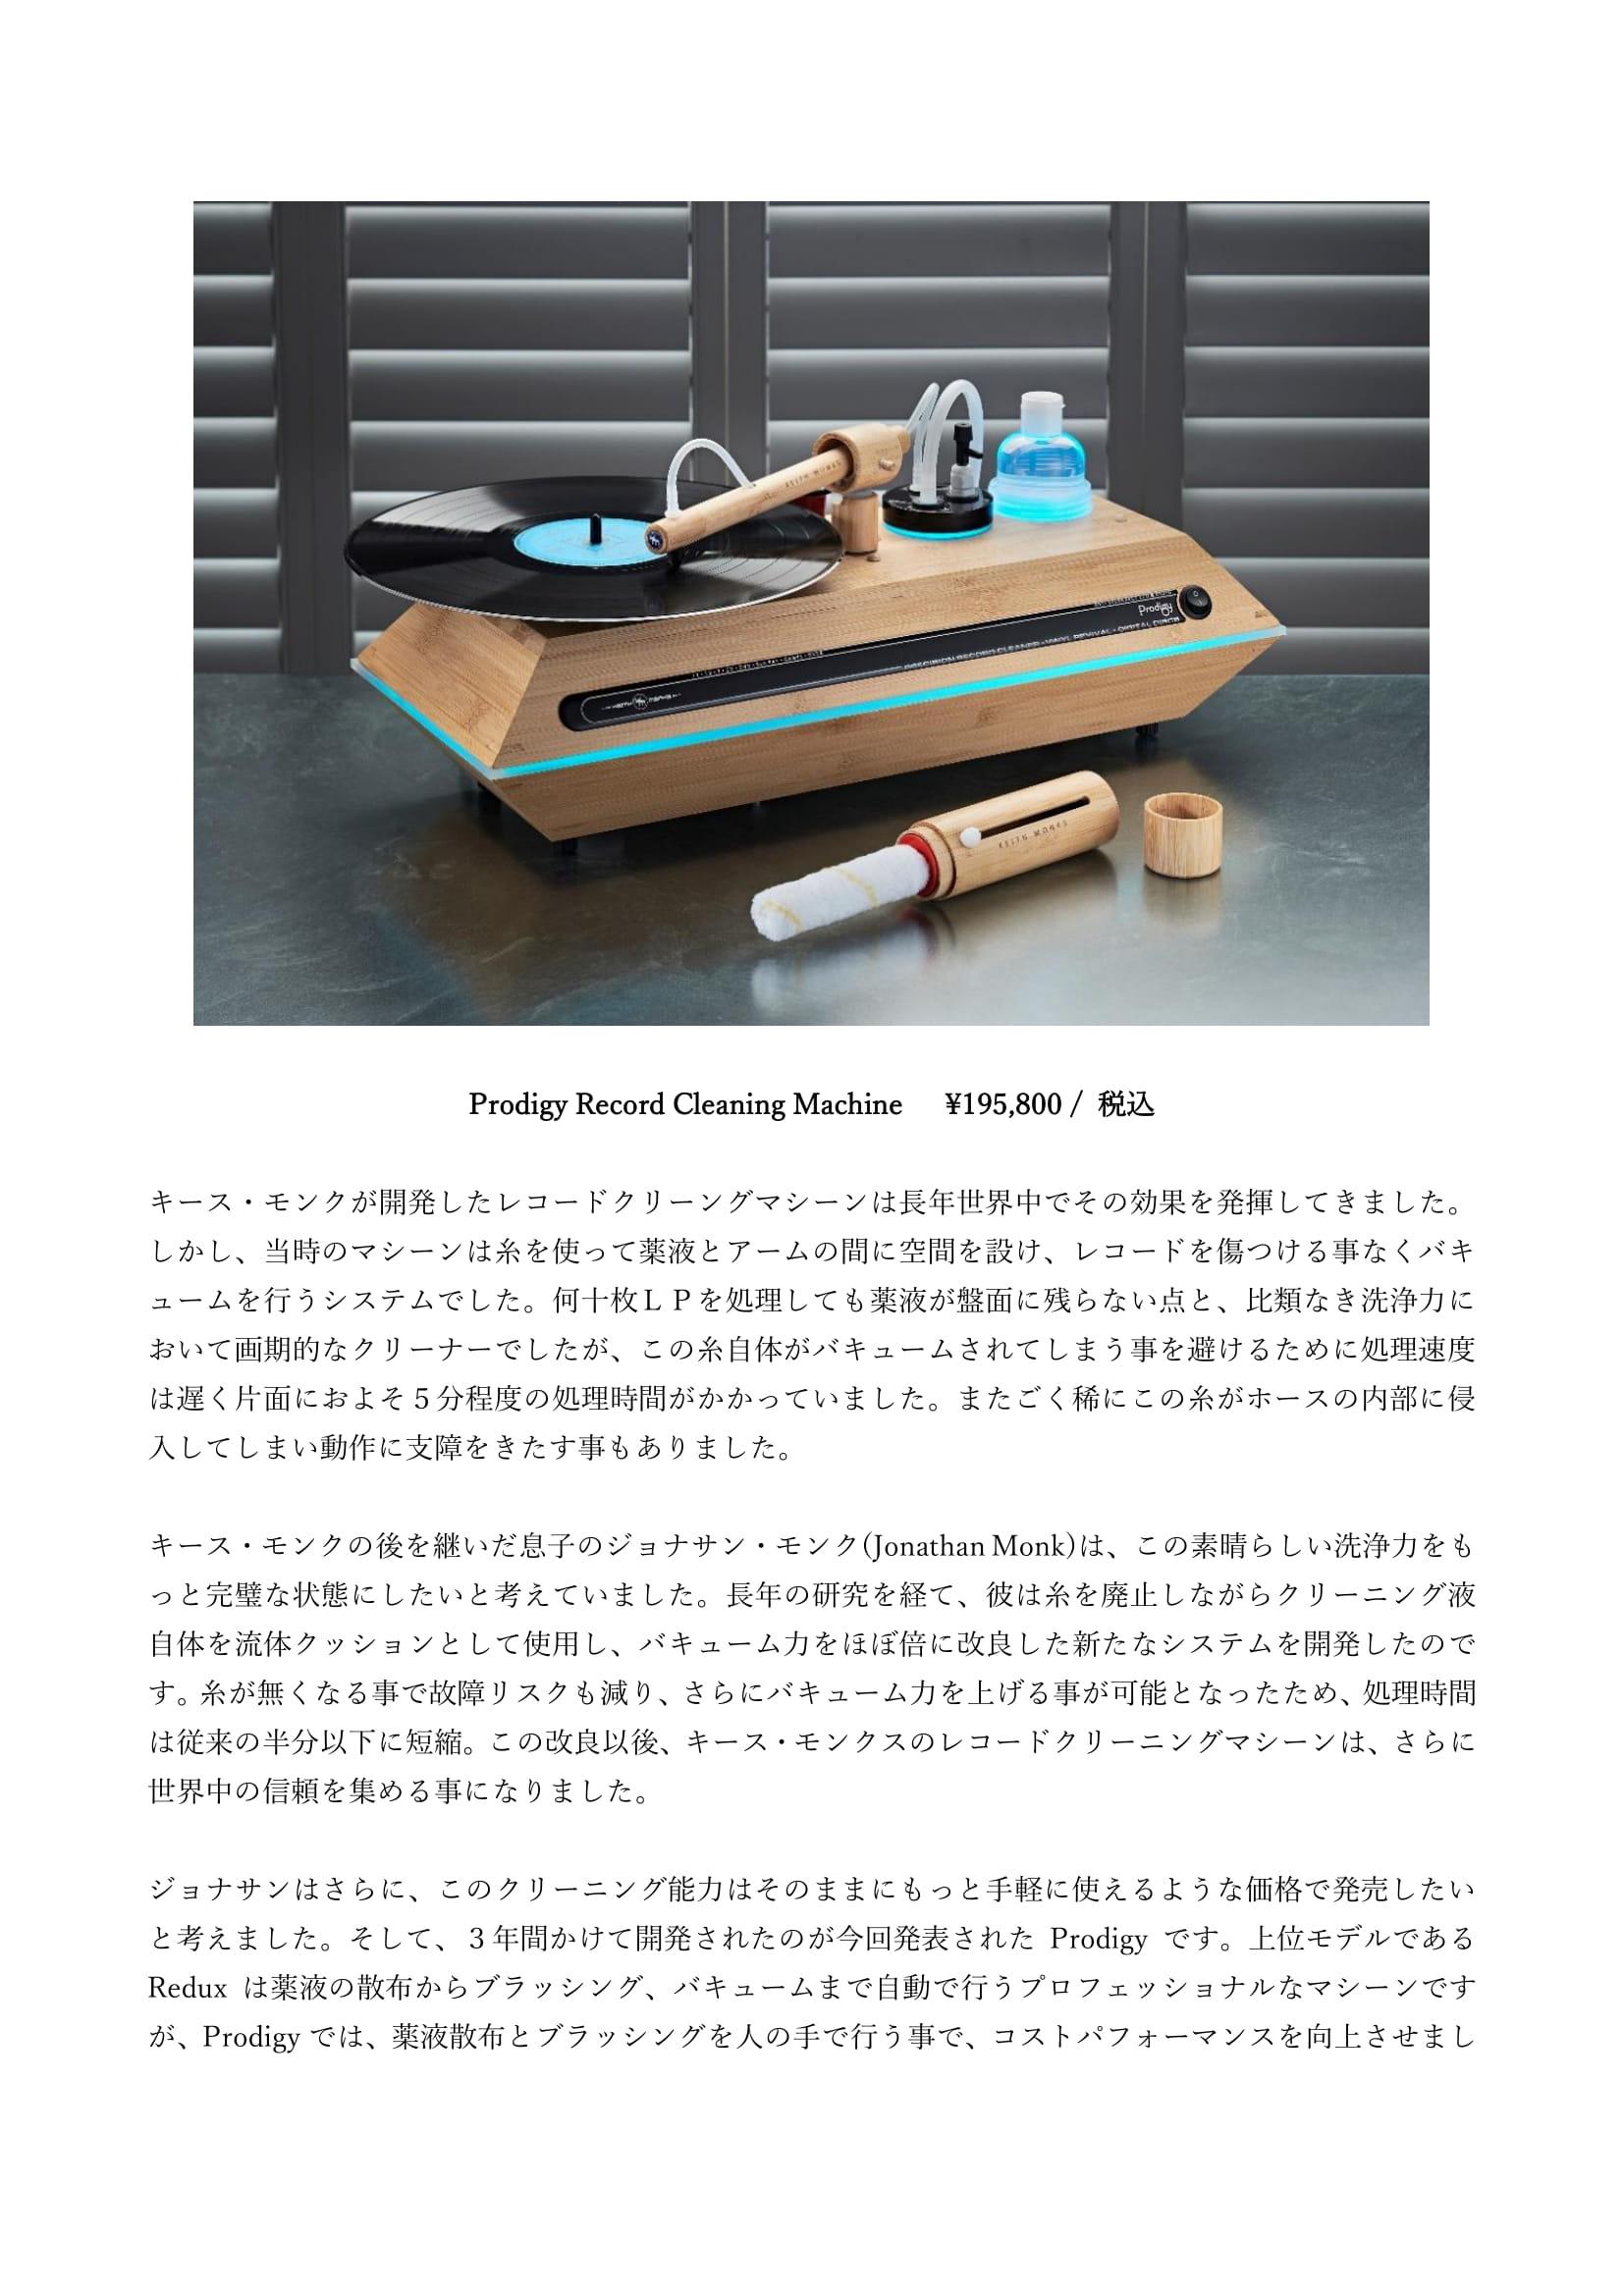 Prodigy製品資料-2